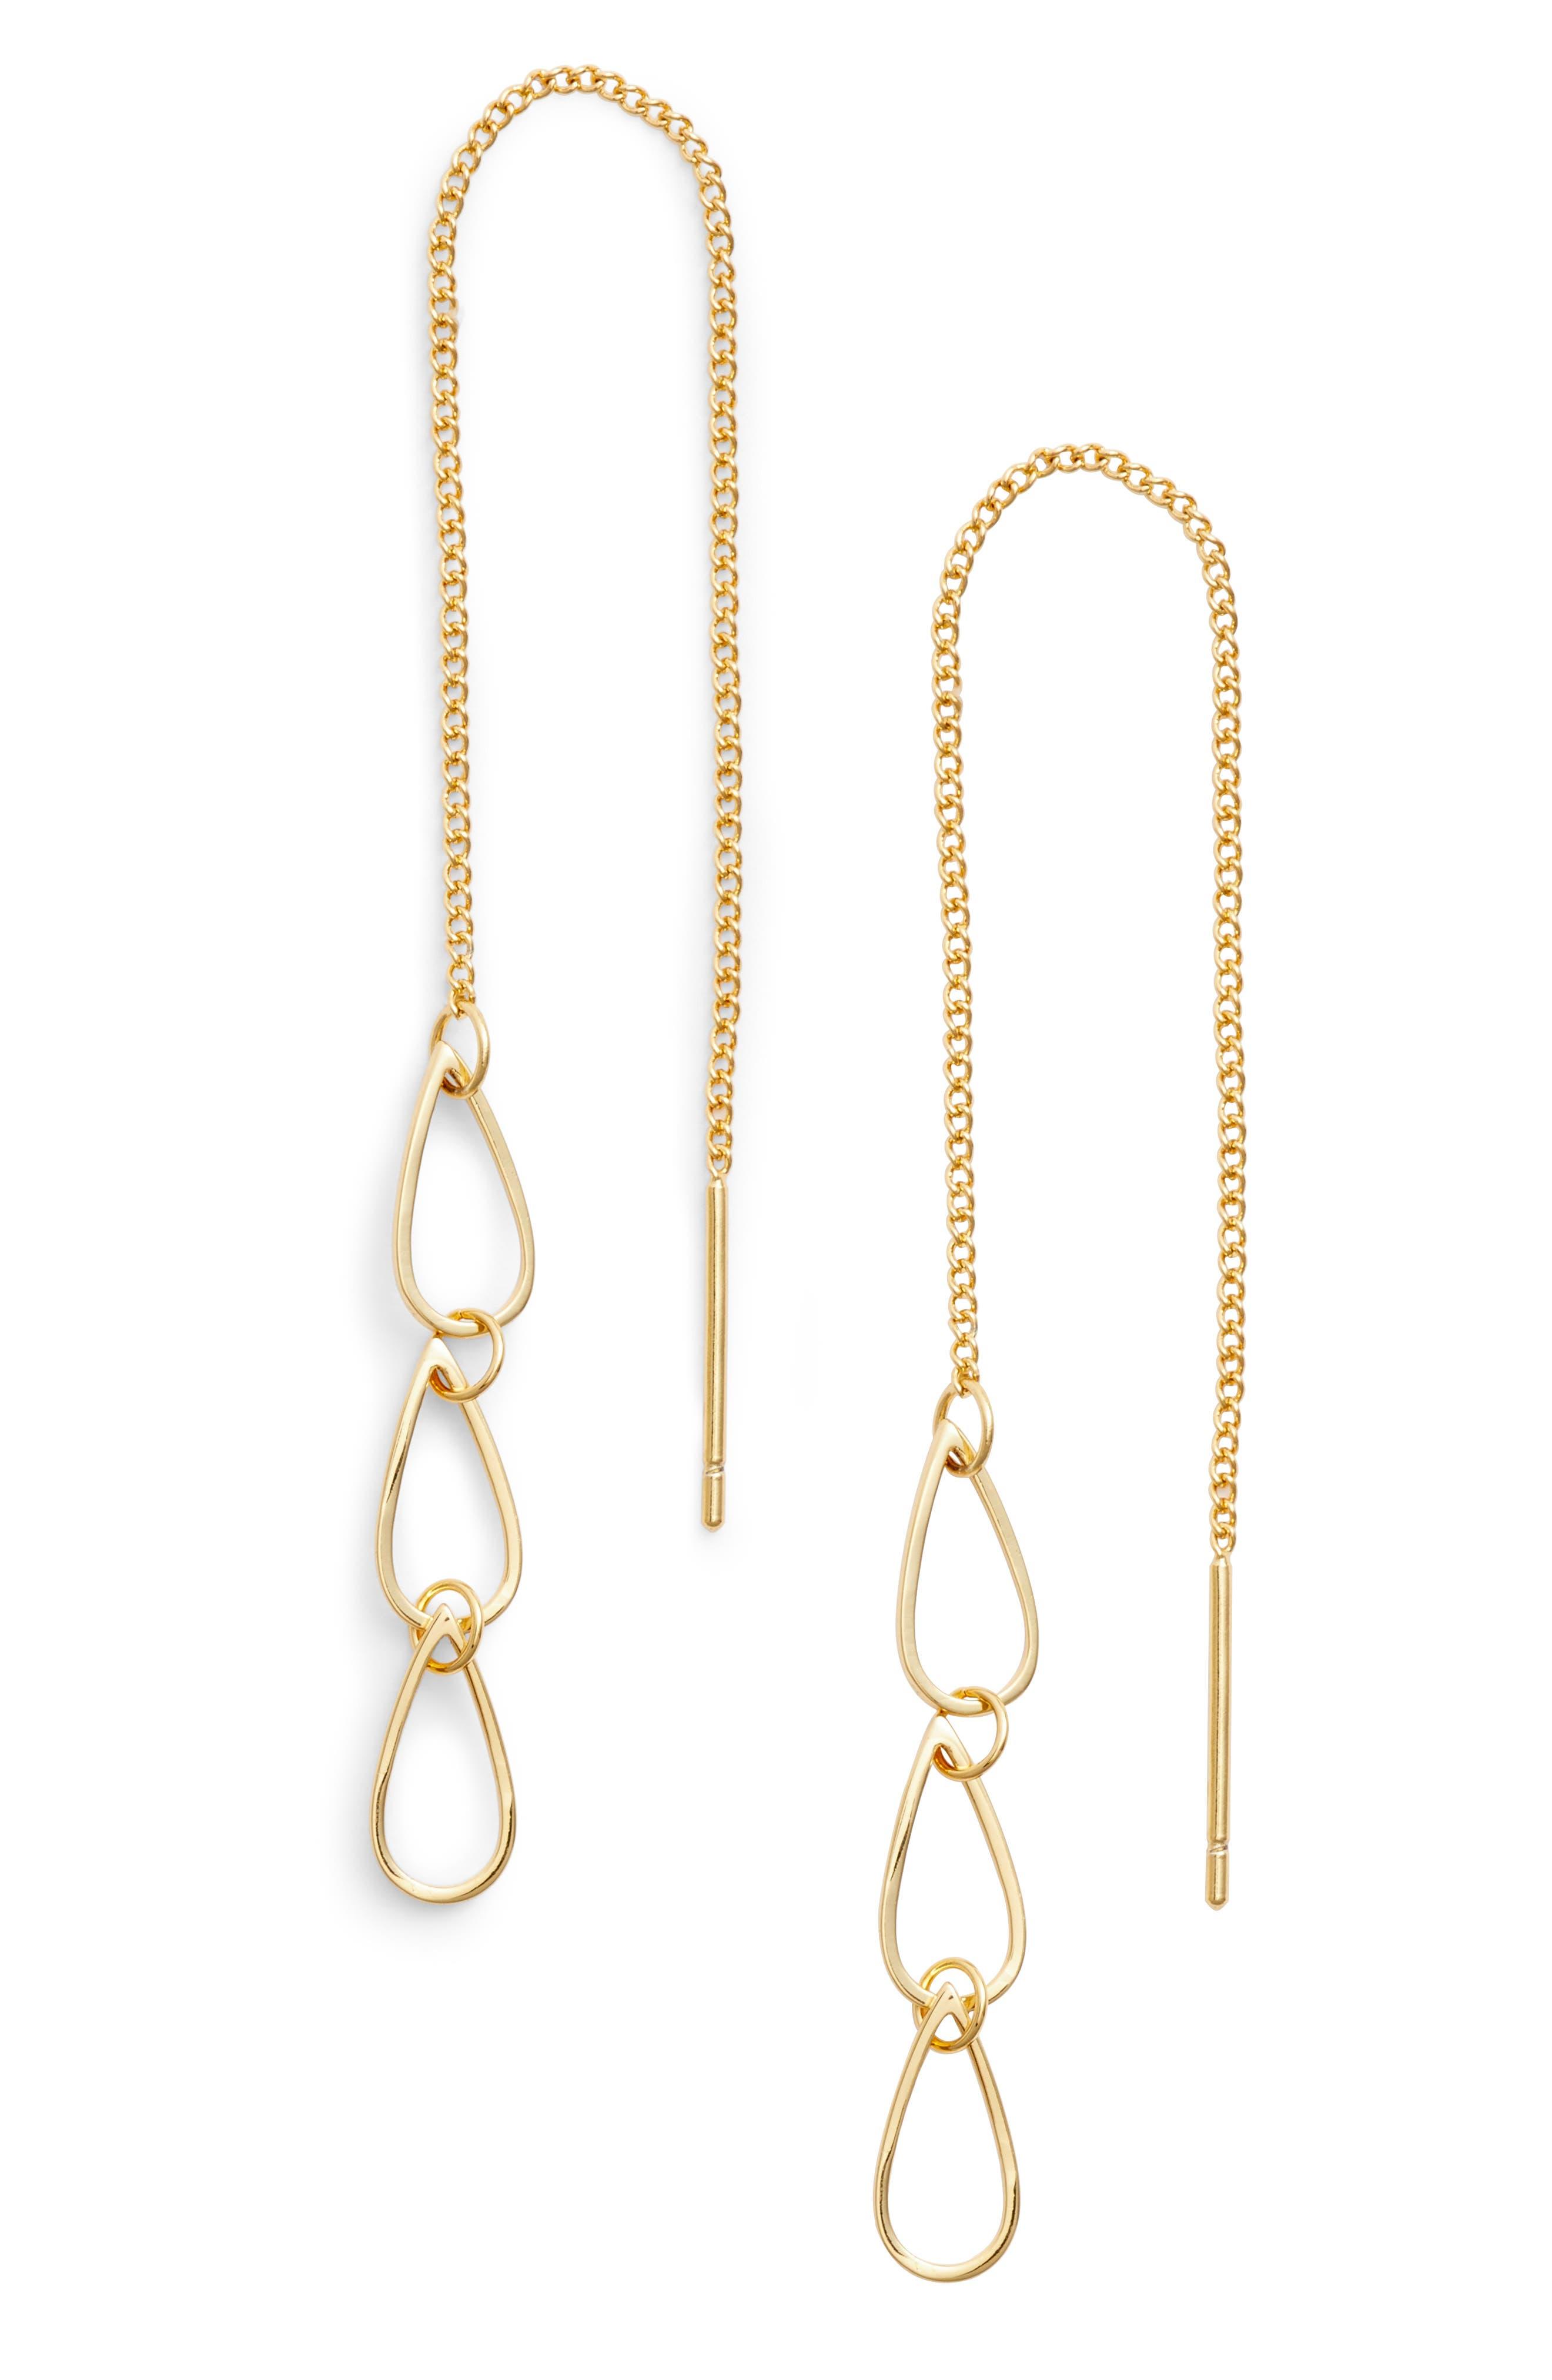 Leiko Threader Earrings,                         Main,                         color, Gold